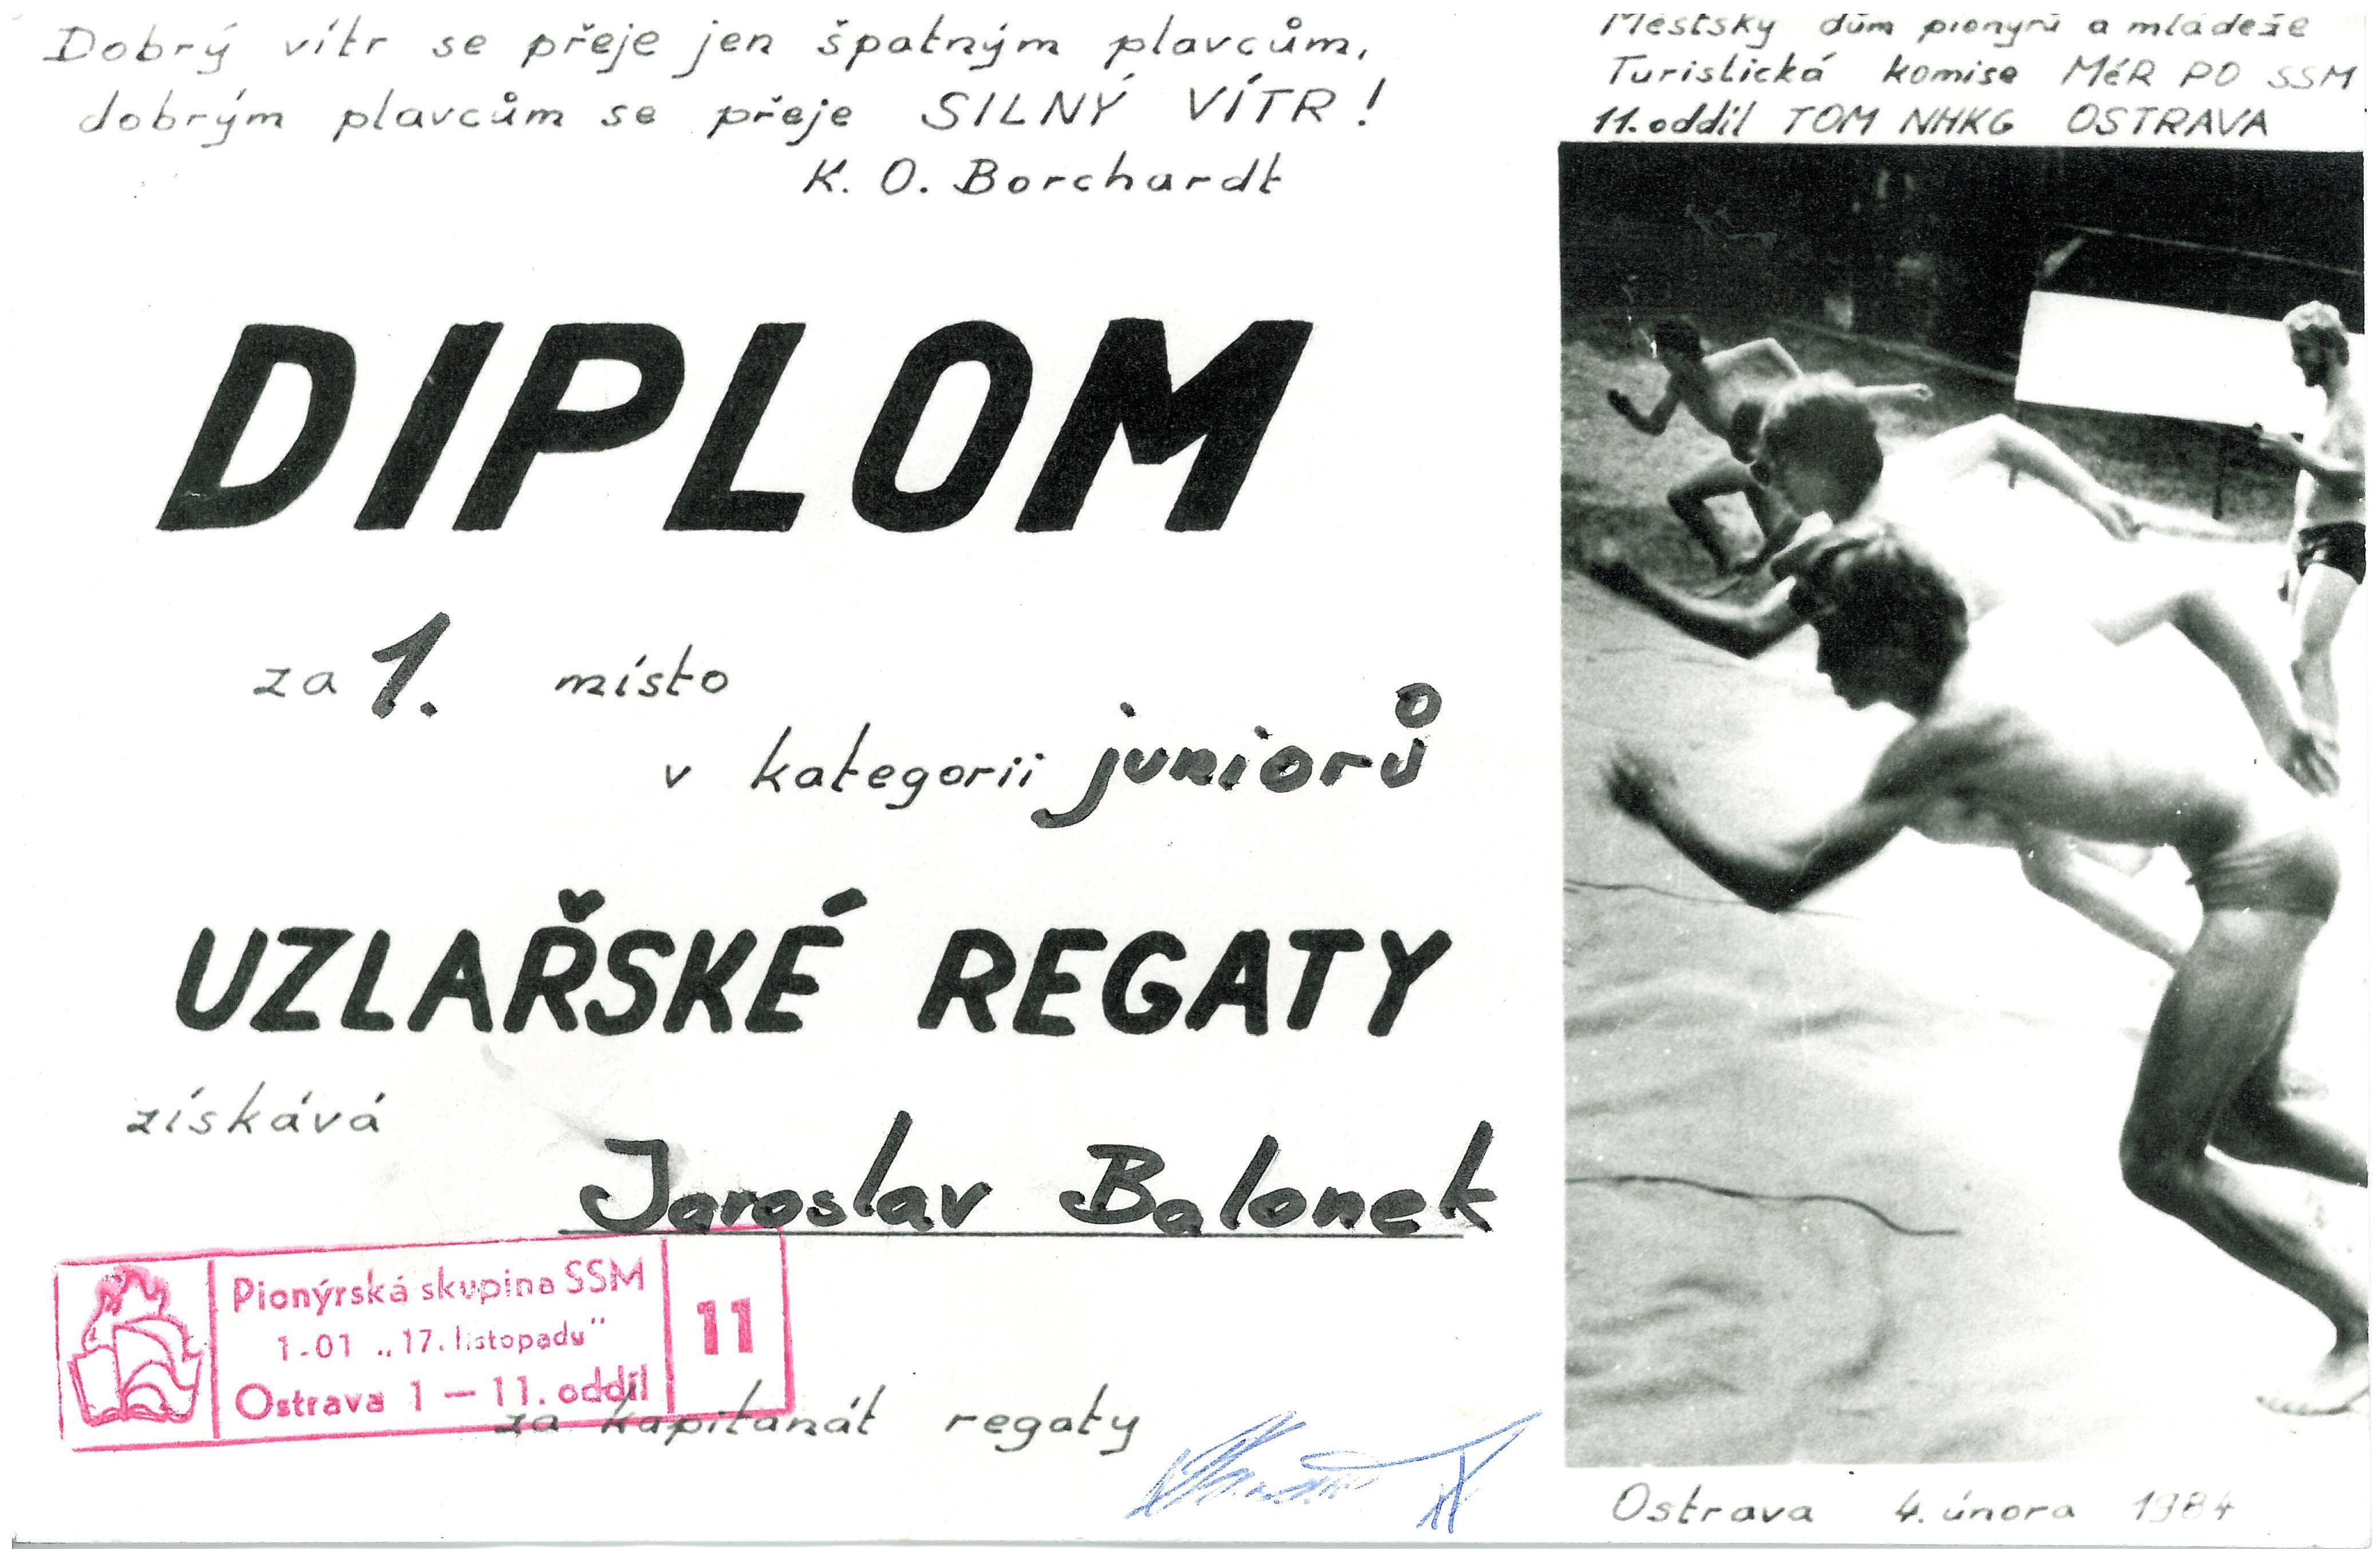 1984 - Uzlařská regata Ostrava